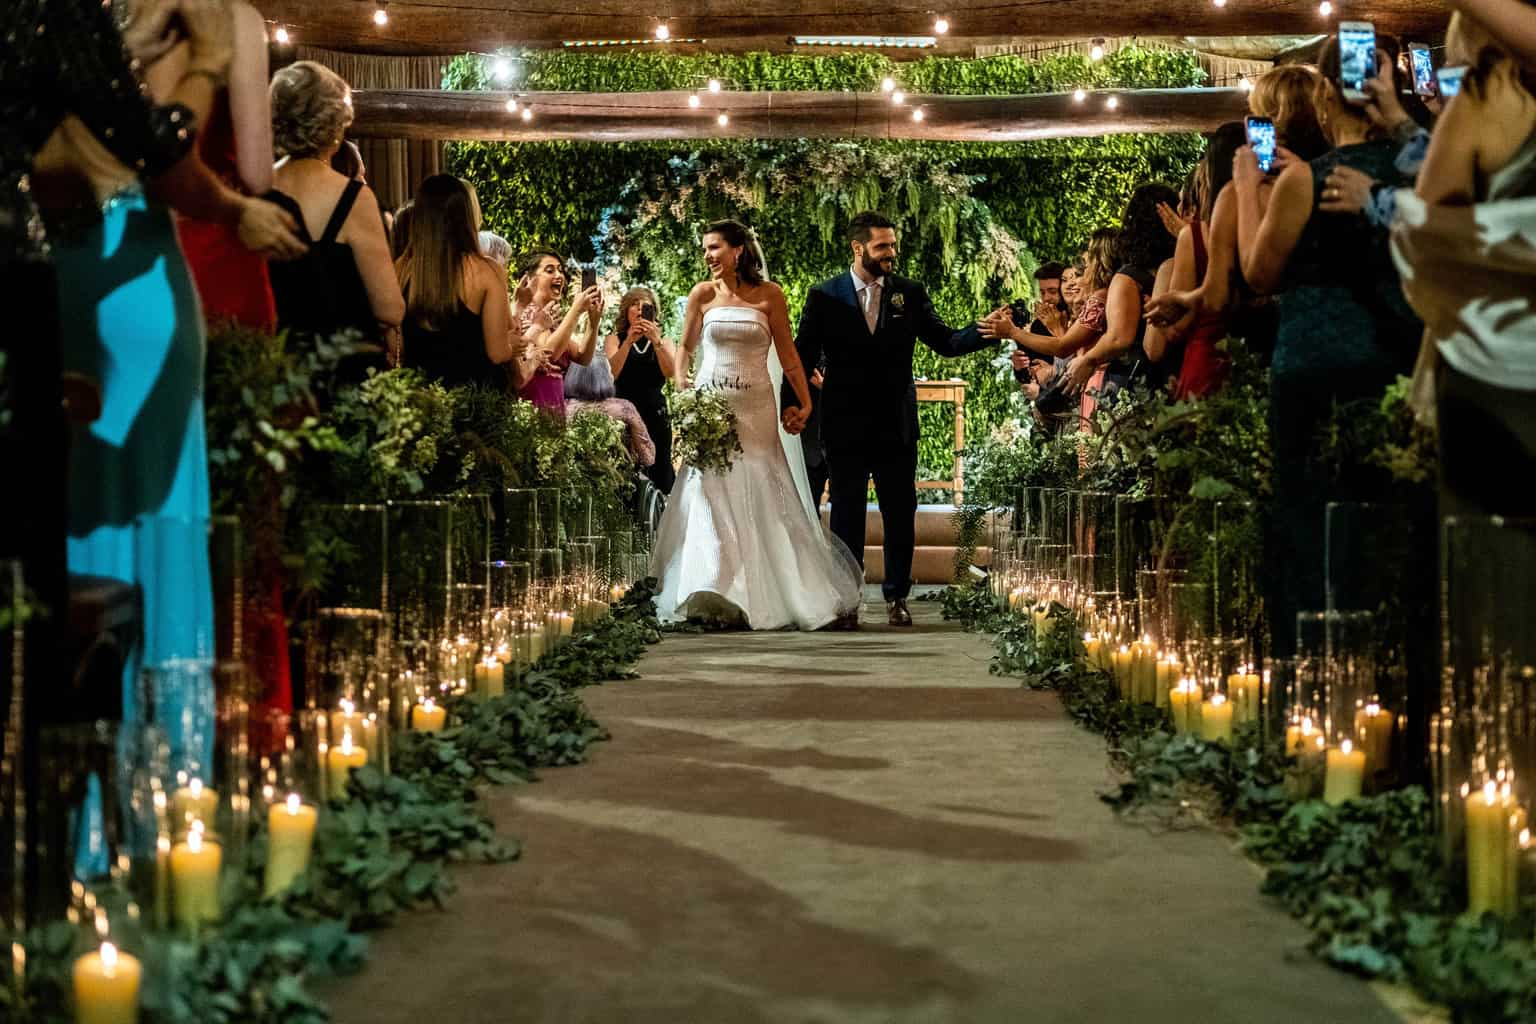 Bel-Benkler-eventos-Casamento-Ariane-e-Matheus-cerimonia-decoracao-contemporanea-fotografia-Rafael-Bigarelli-noivos-na-pista-Spazio-Giardini-16